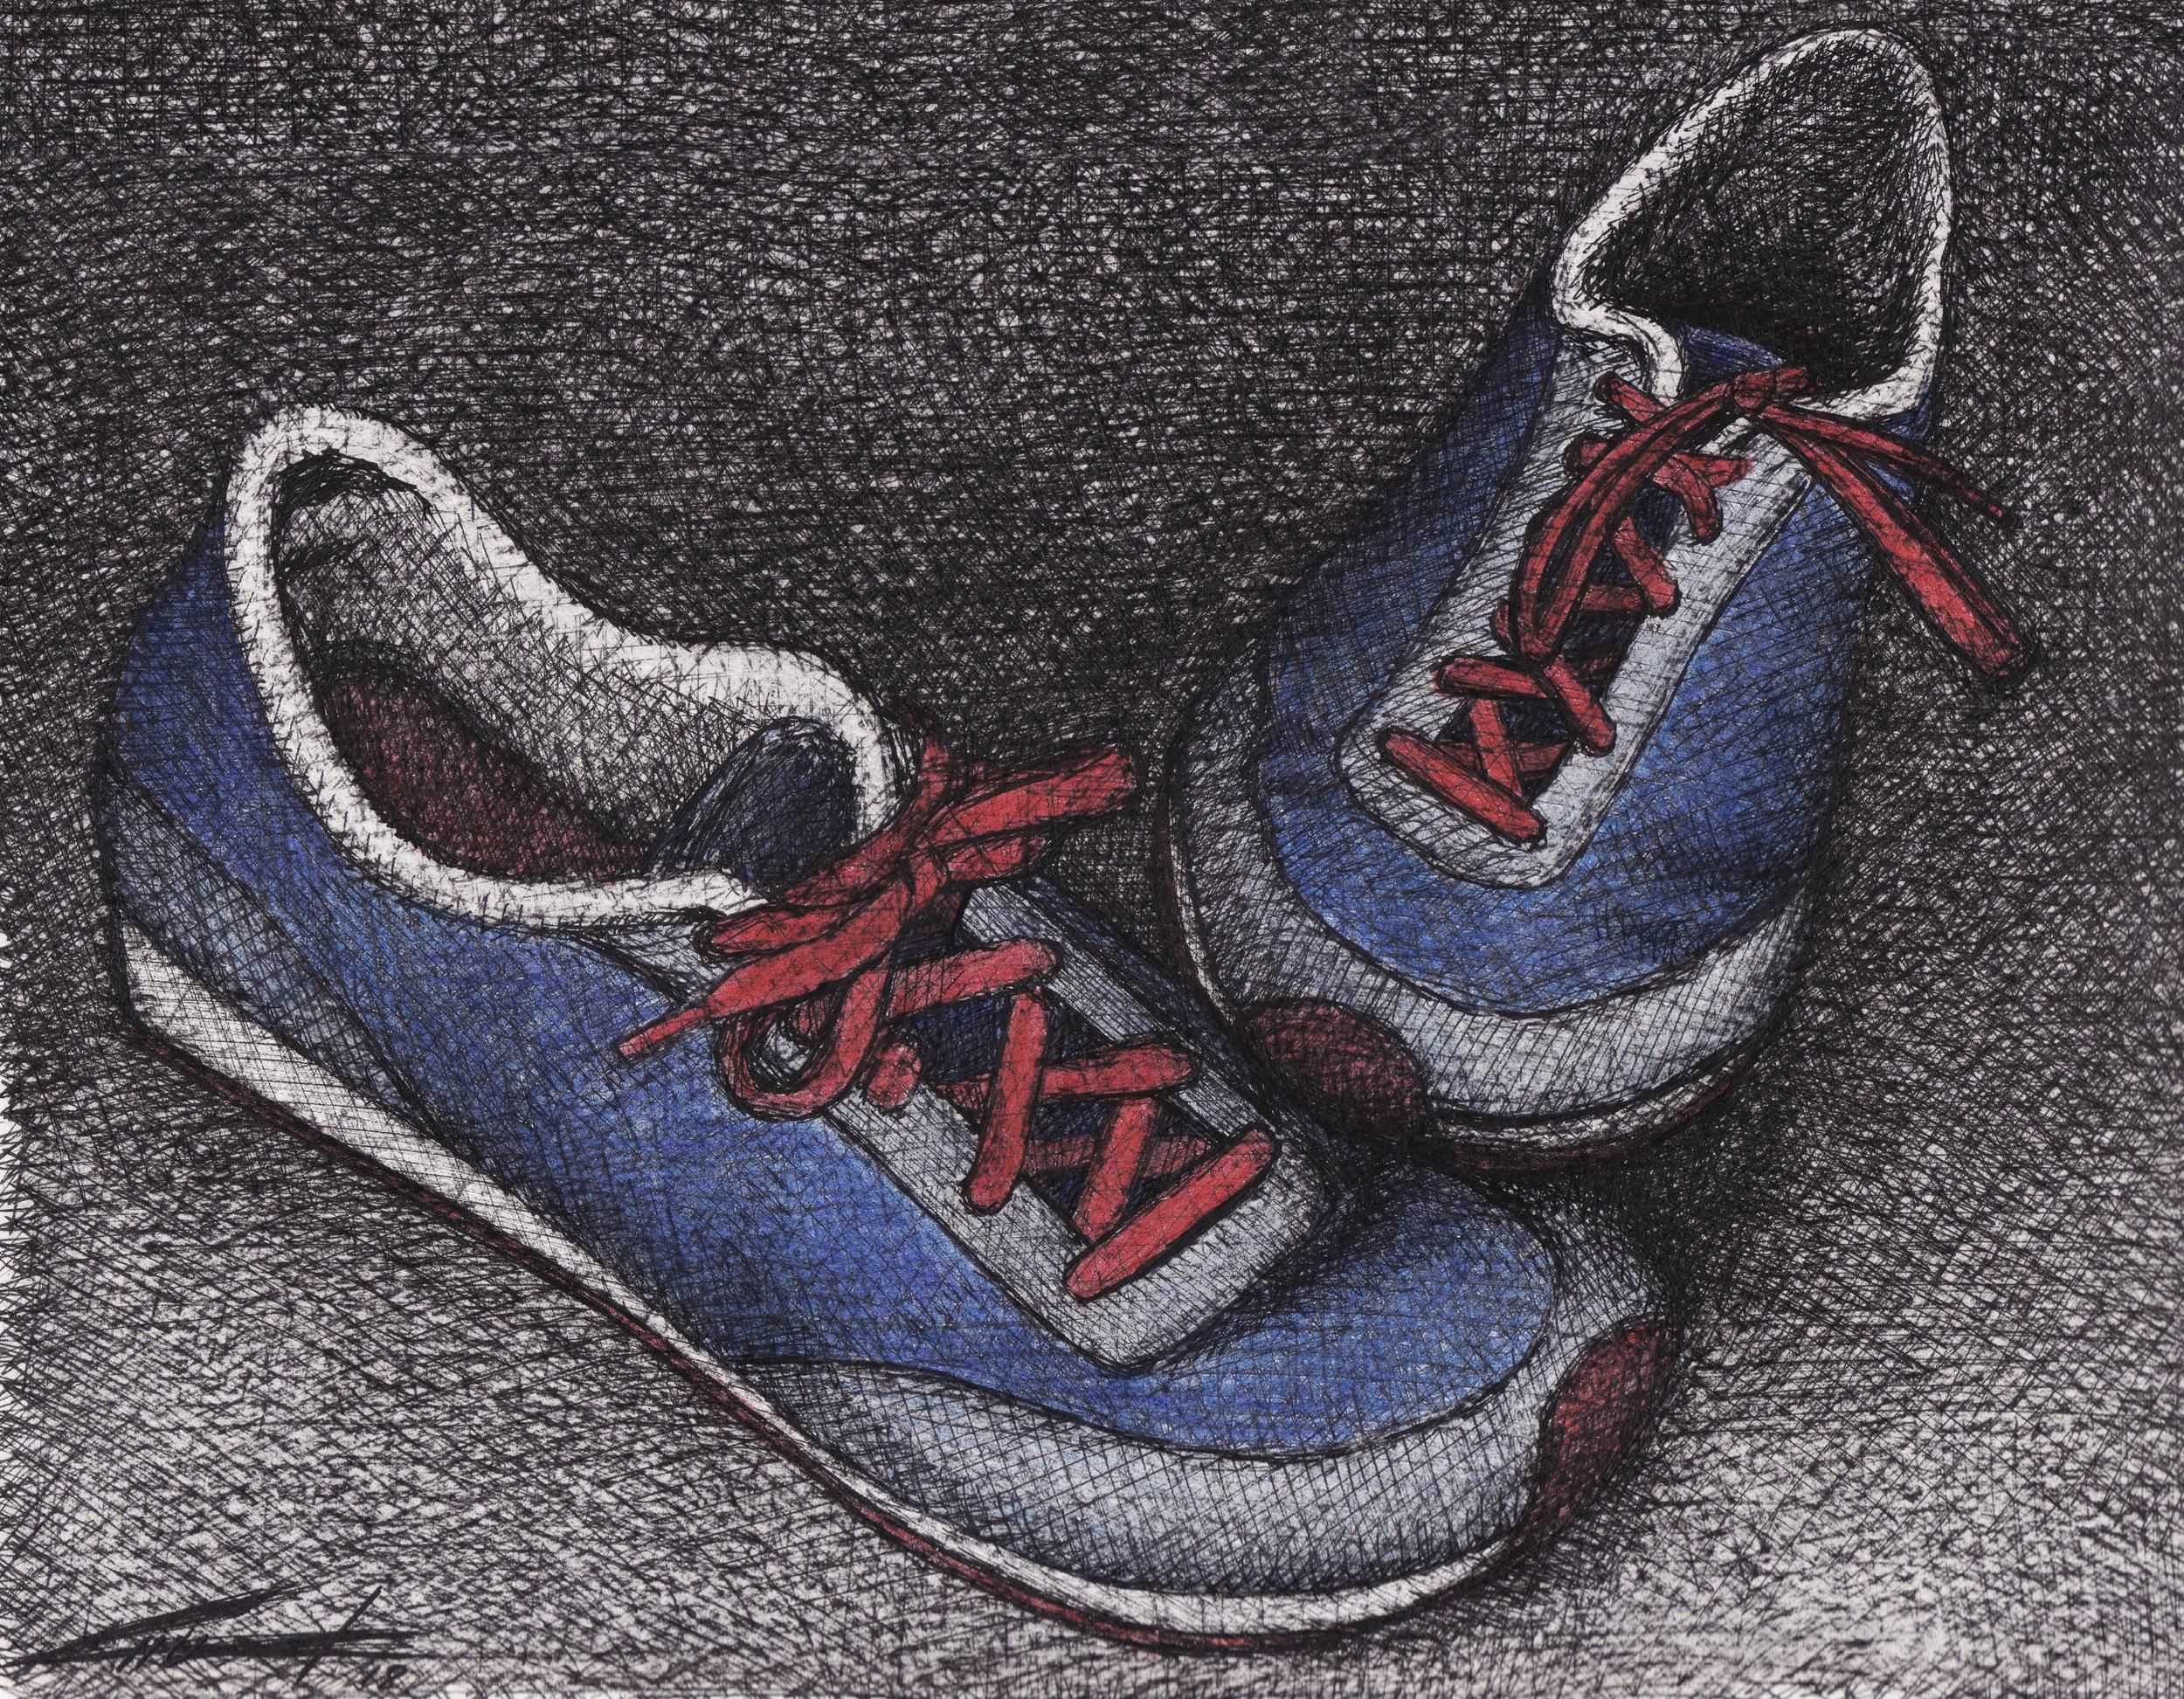 Chuck_McCarthy_shoes.jpg